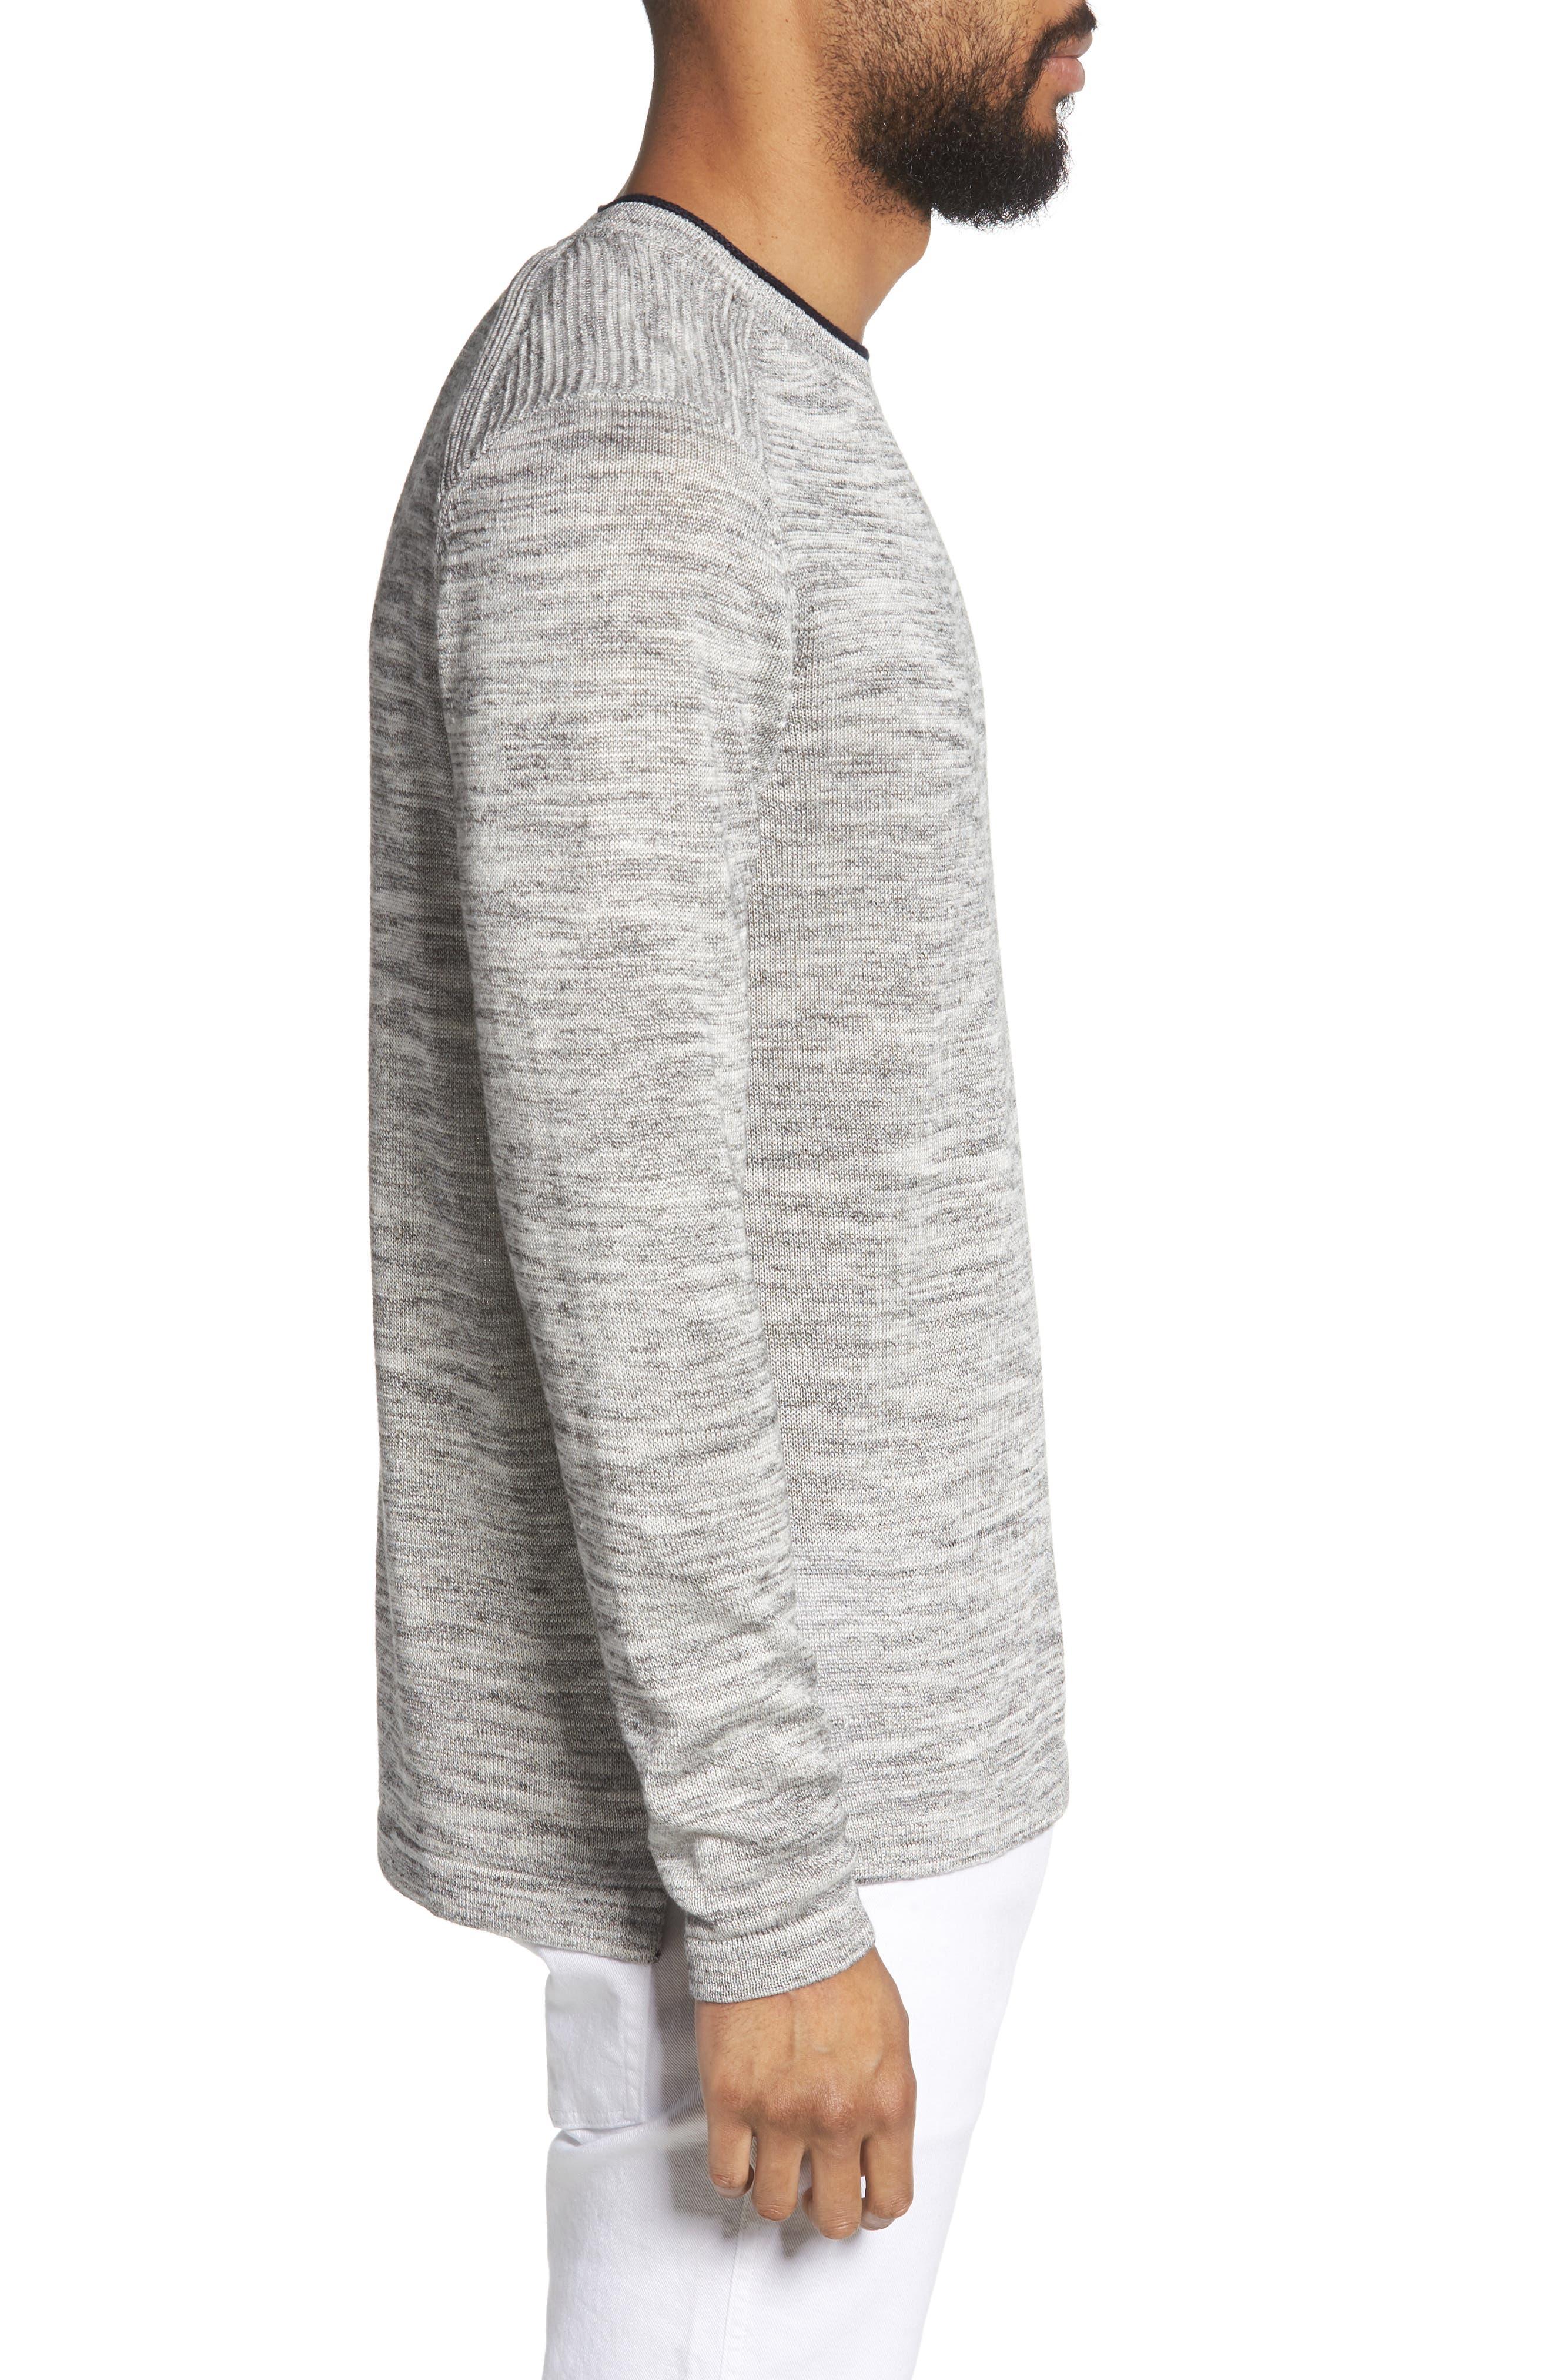 Inzone Crewneck Linen Blend Sweater,                             Alternate thumbnail 3, color,                             050